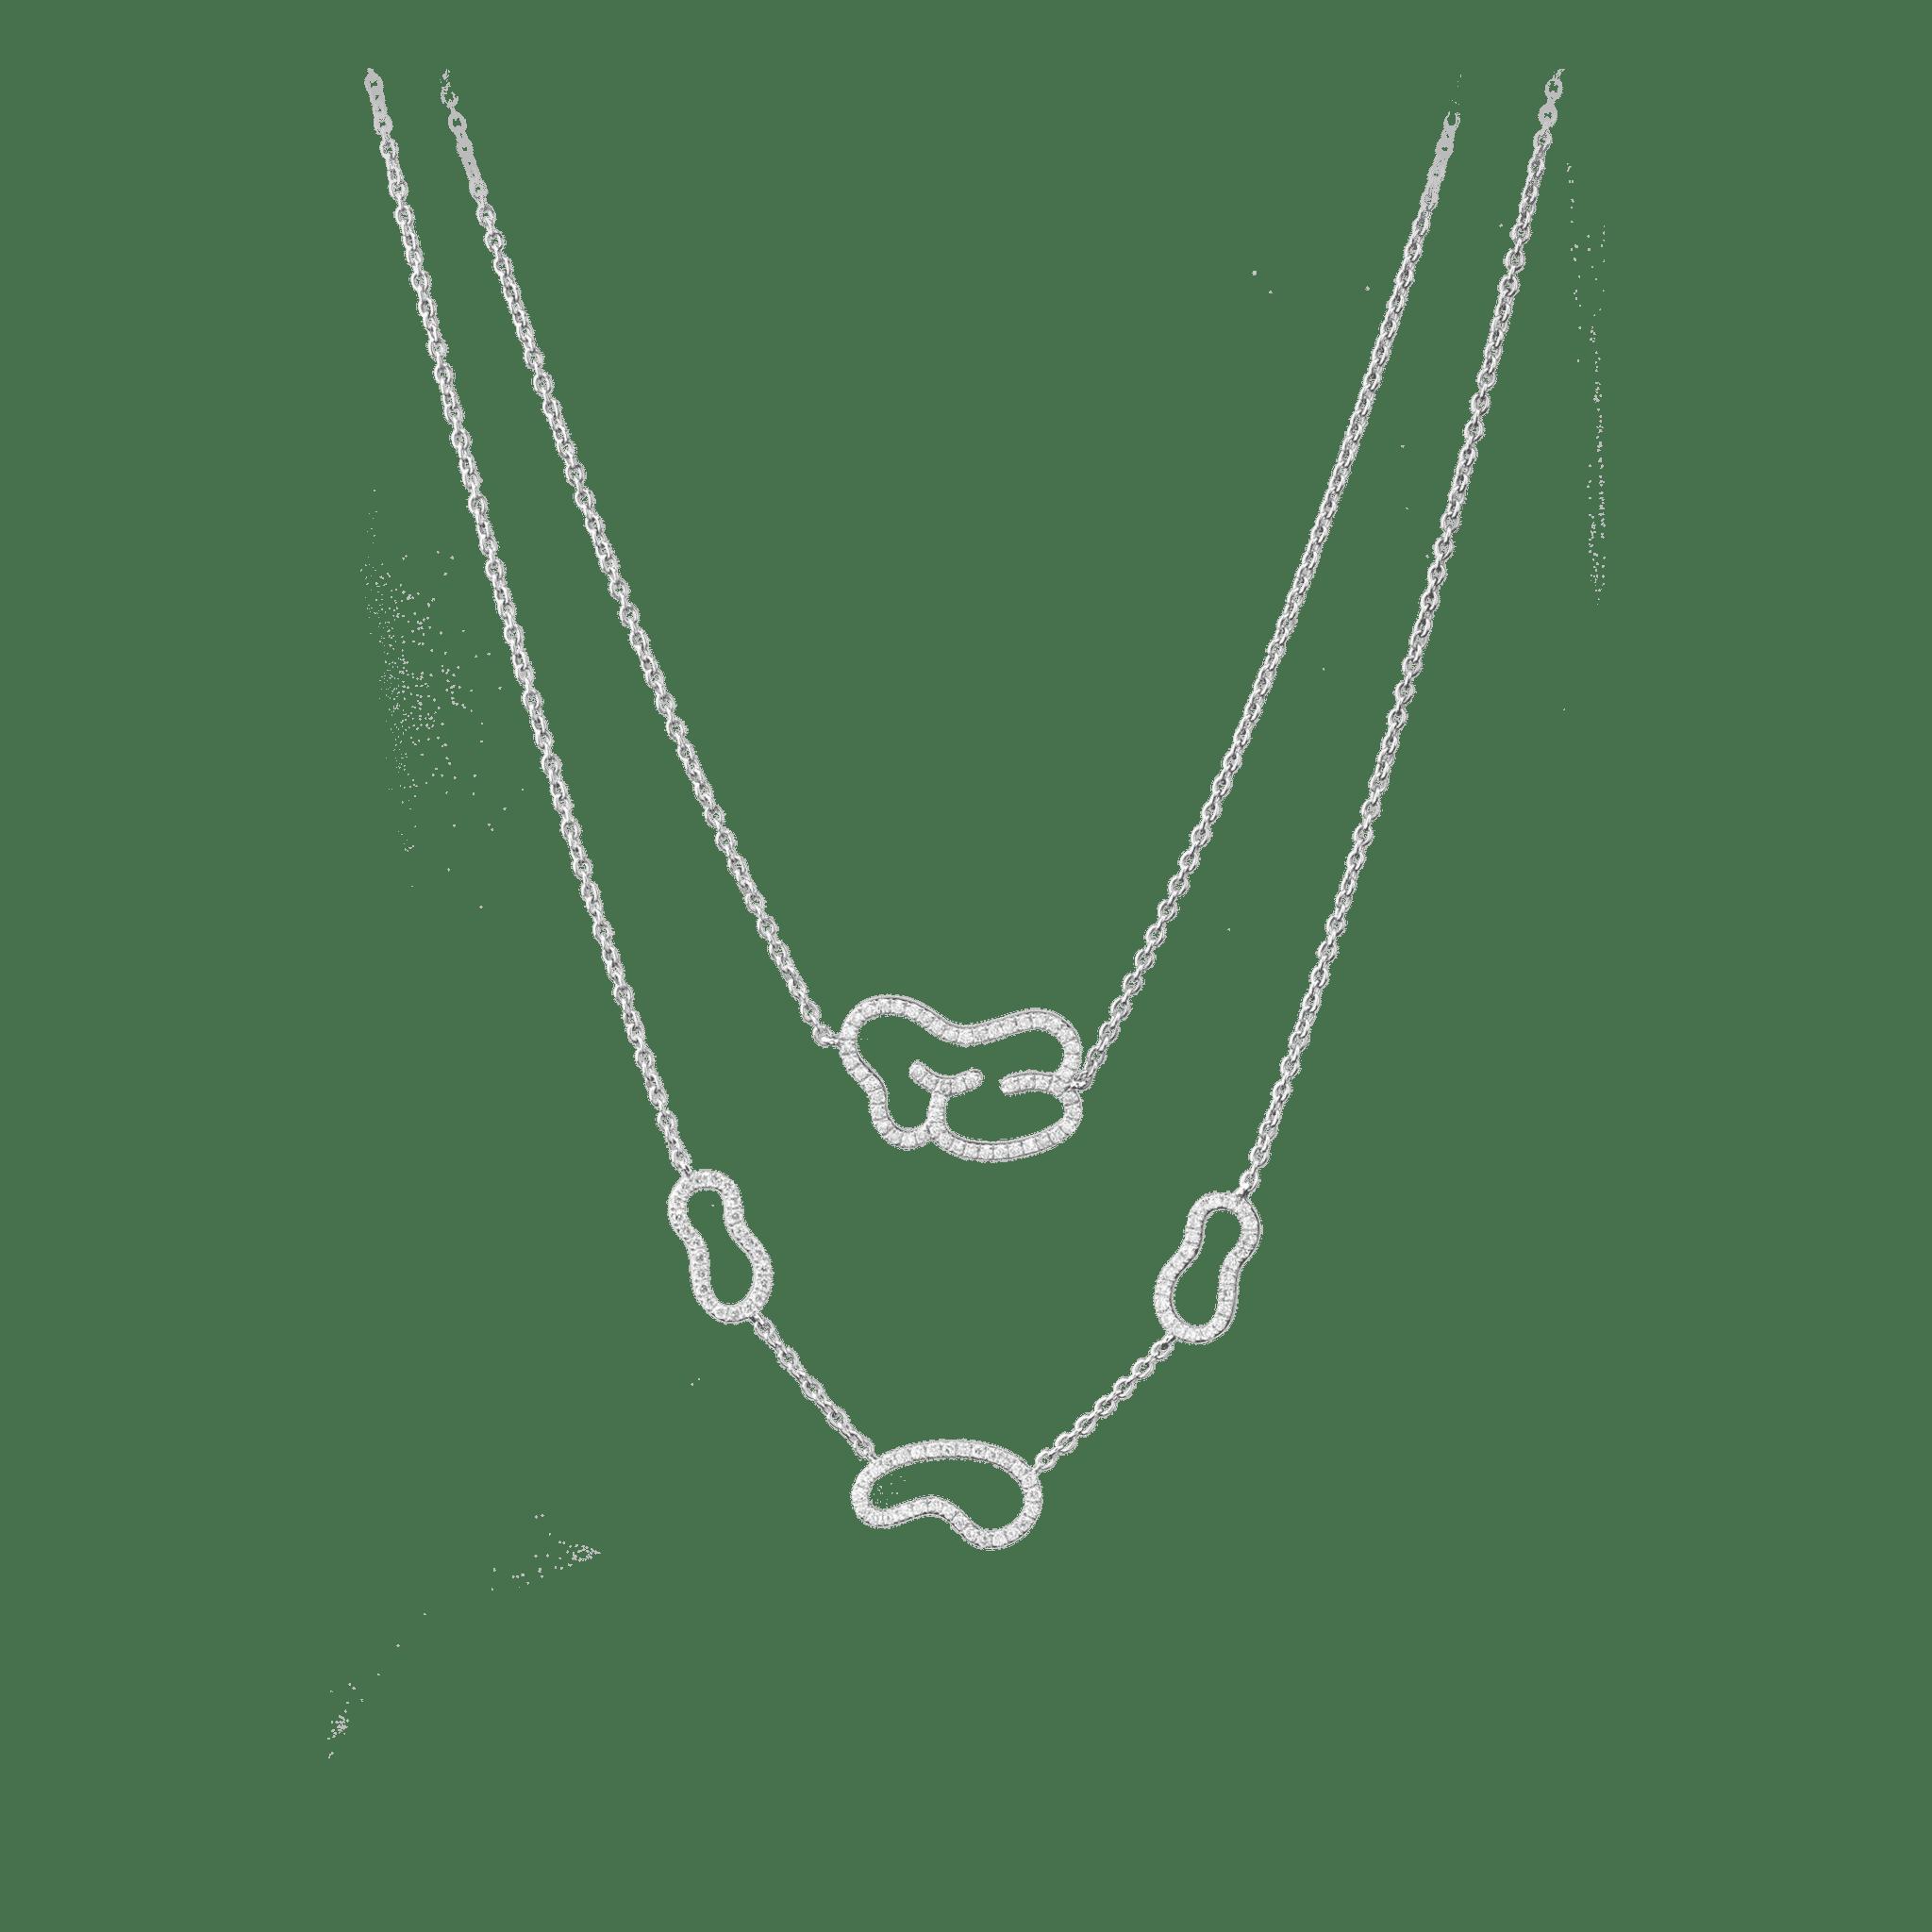 Empreinte collier or blanc et diamant